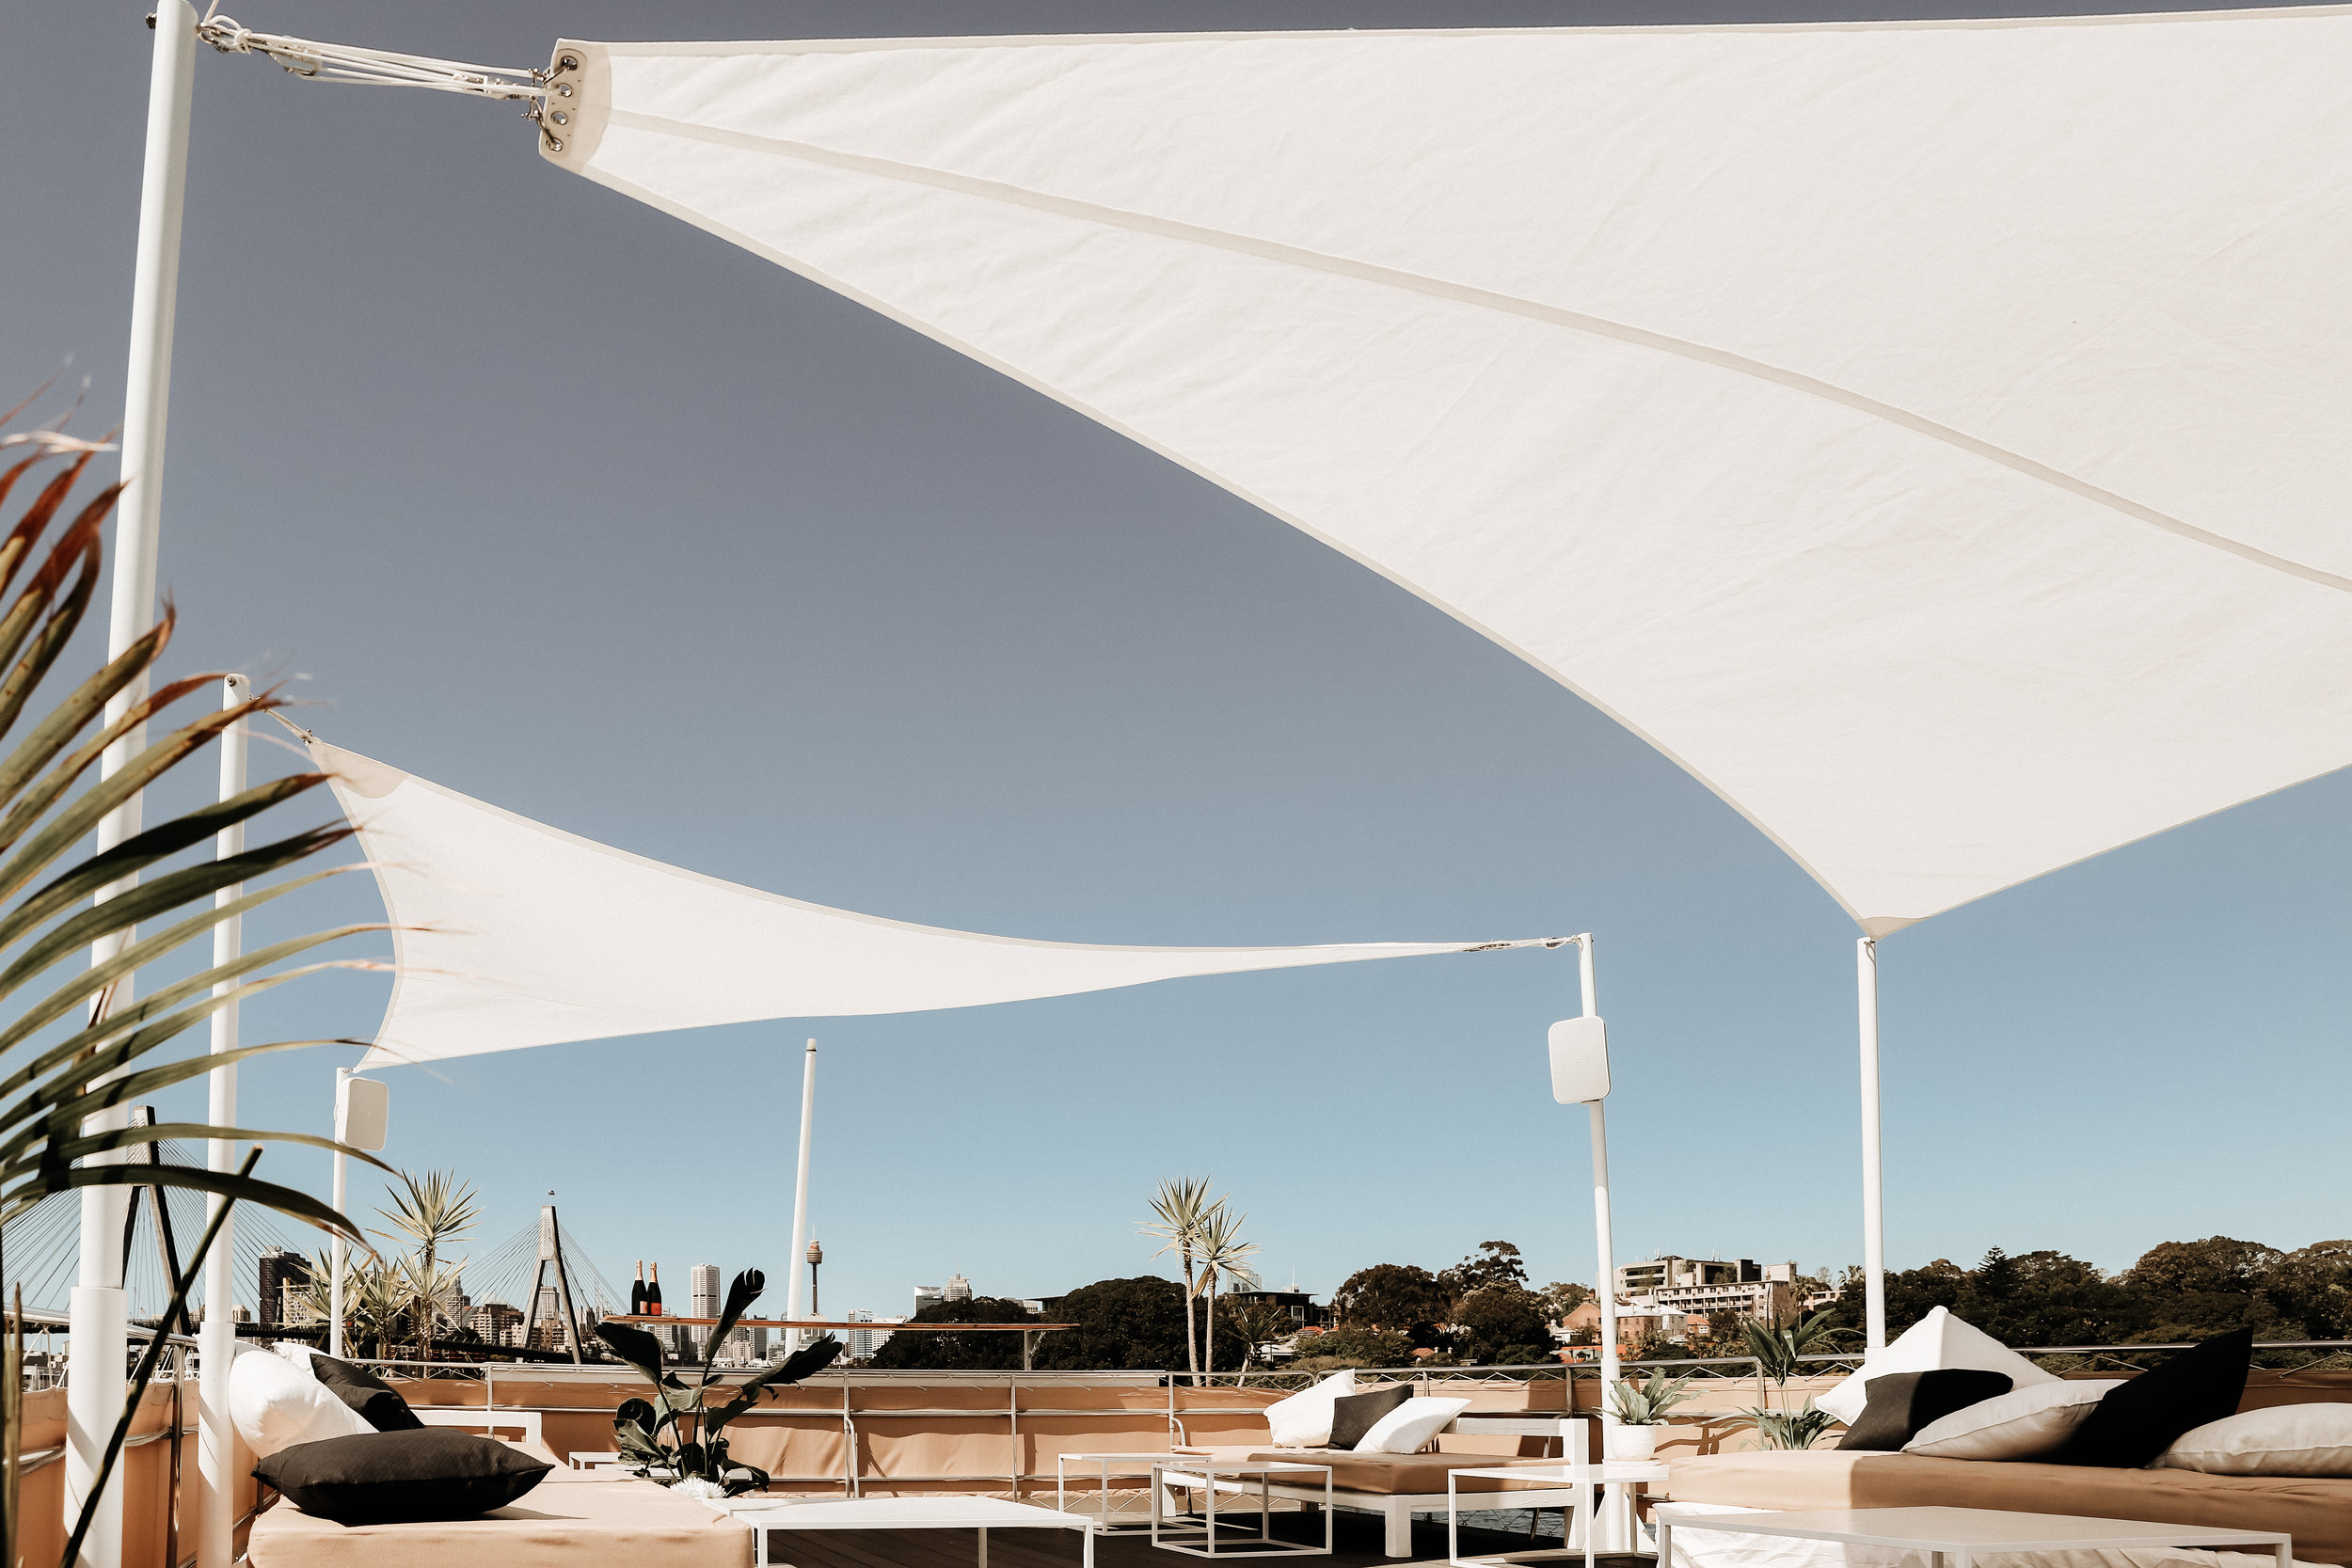 Hamptons Sydney sun deck events yacht party cocktail bar boat hire corporate events sydney harbour .jpg